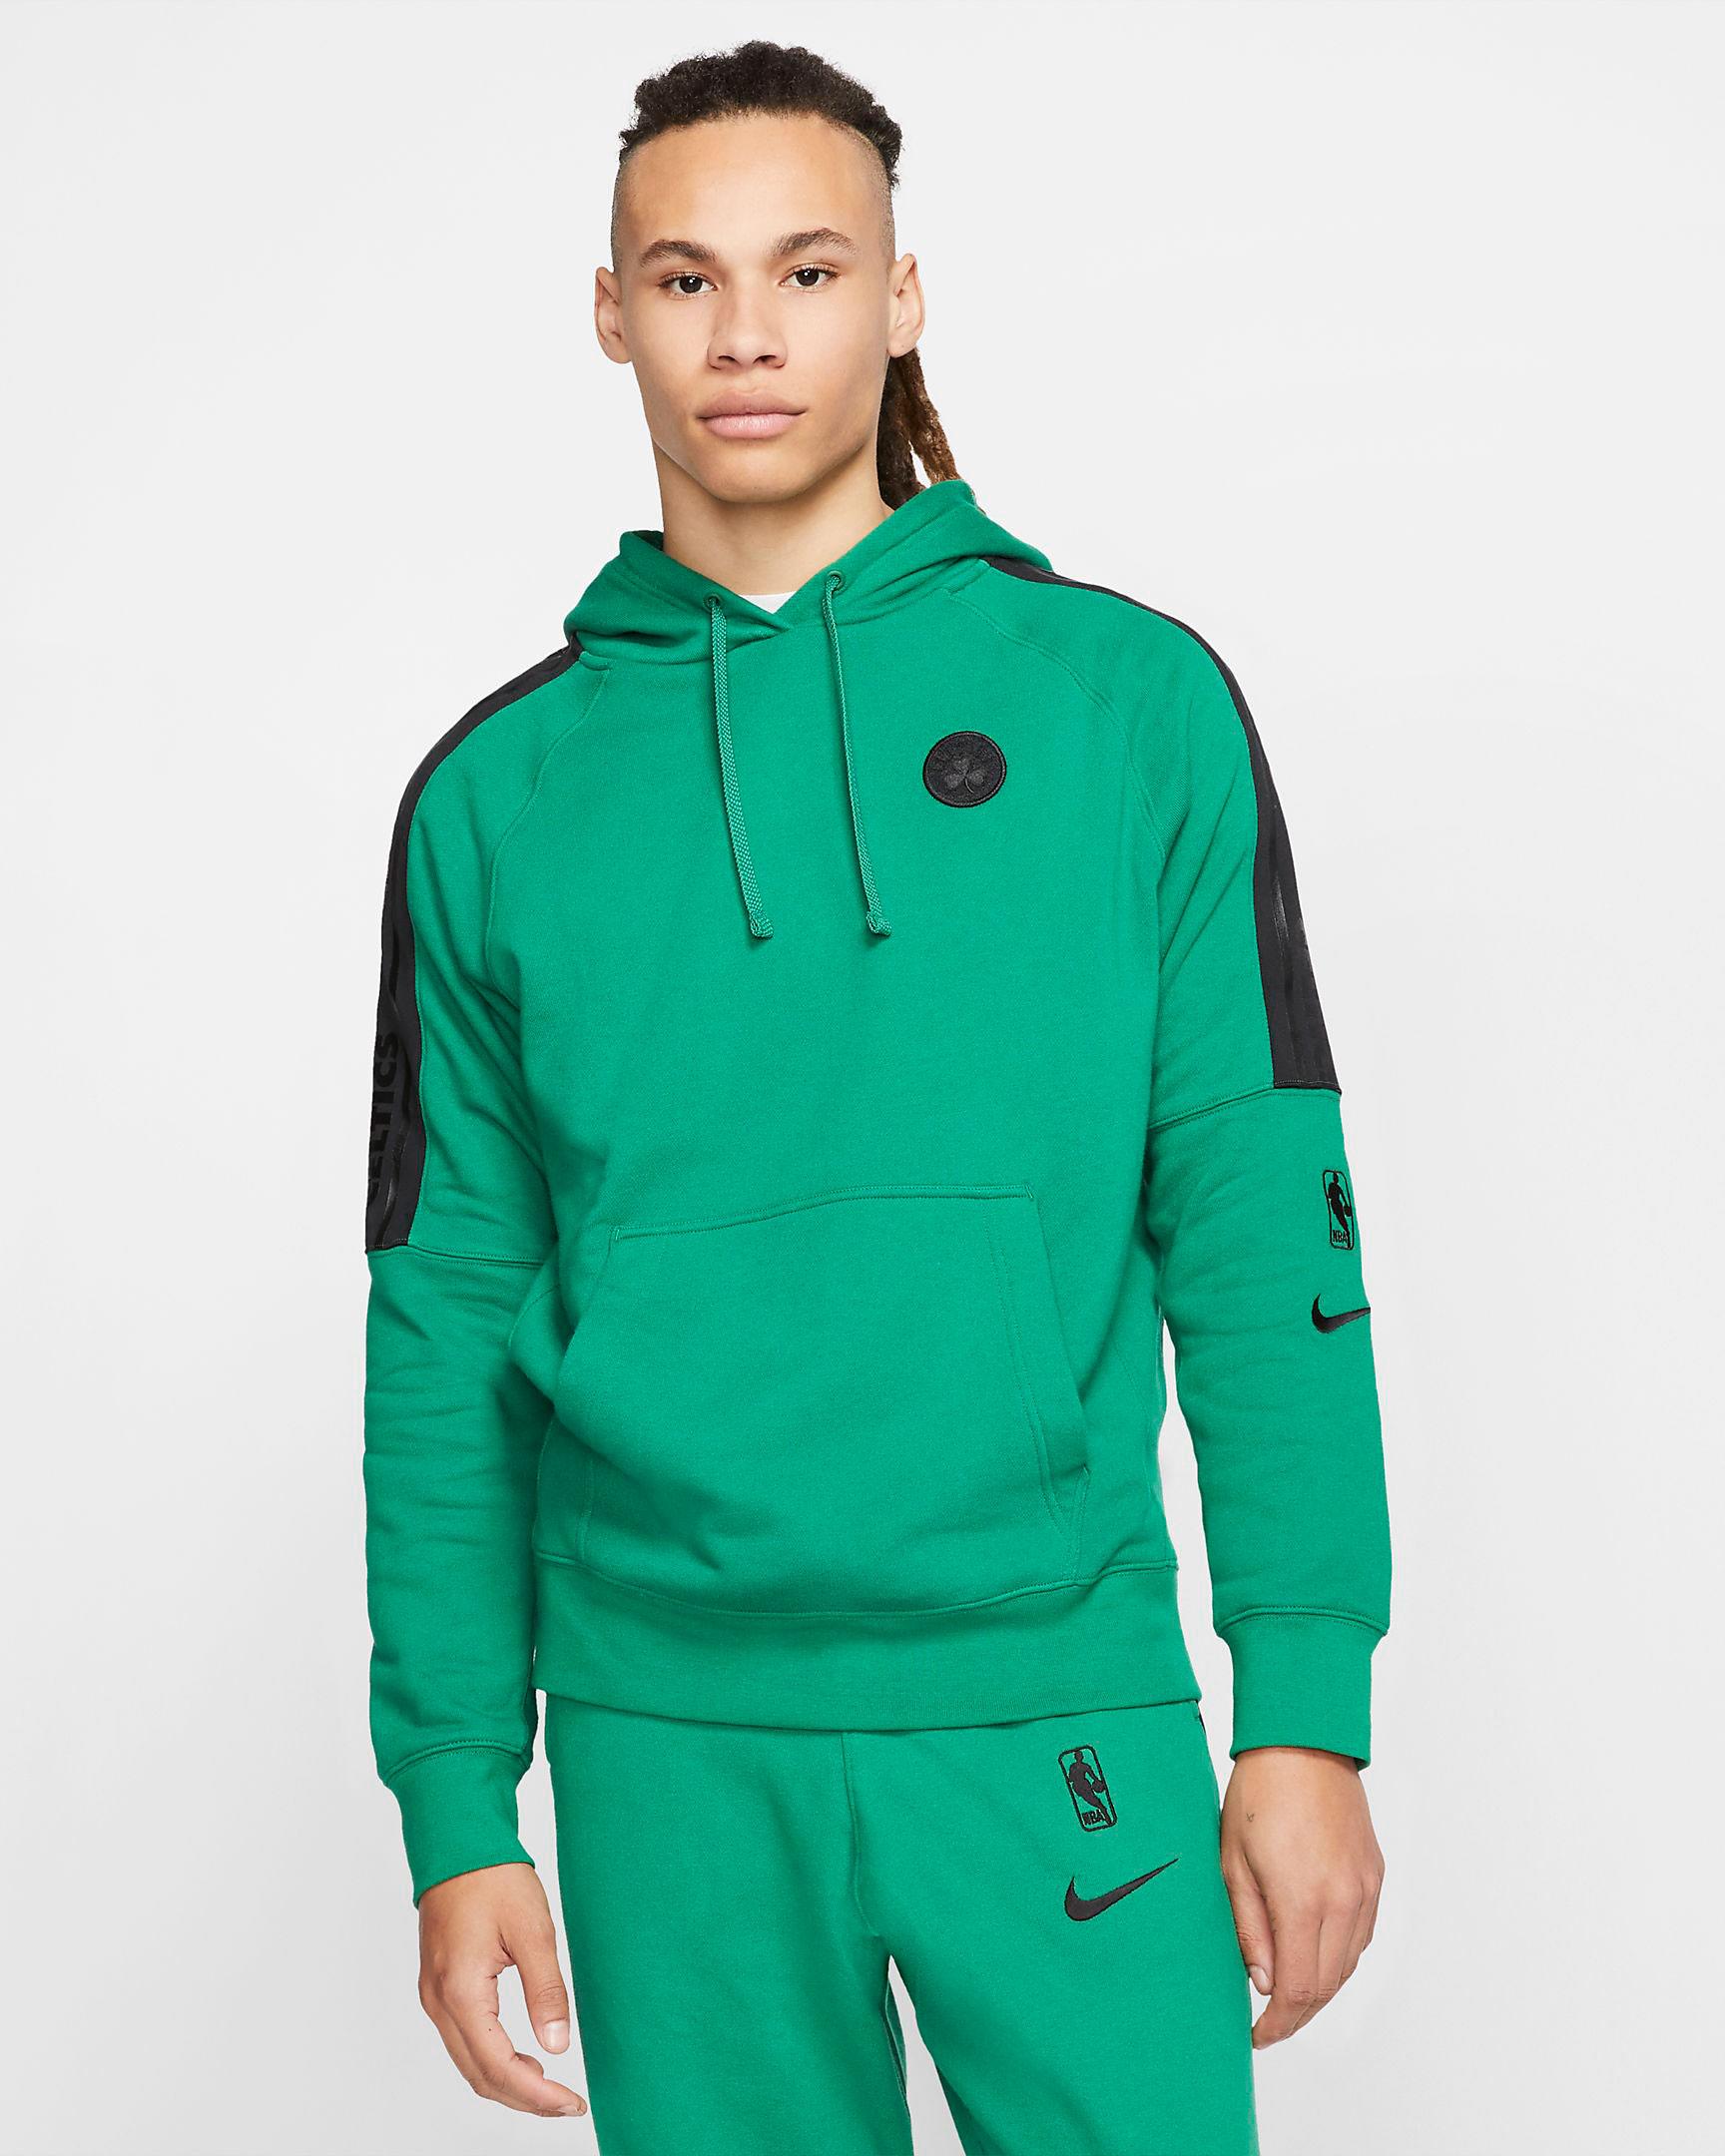 jordan-13-lucky-green-boston-celtics-nike-hoodie-1